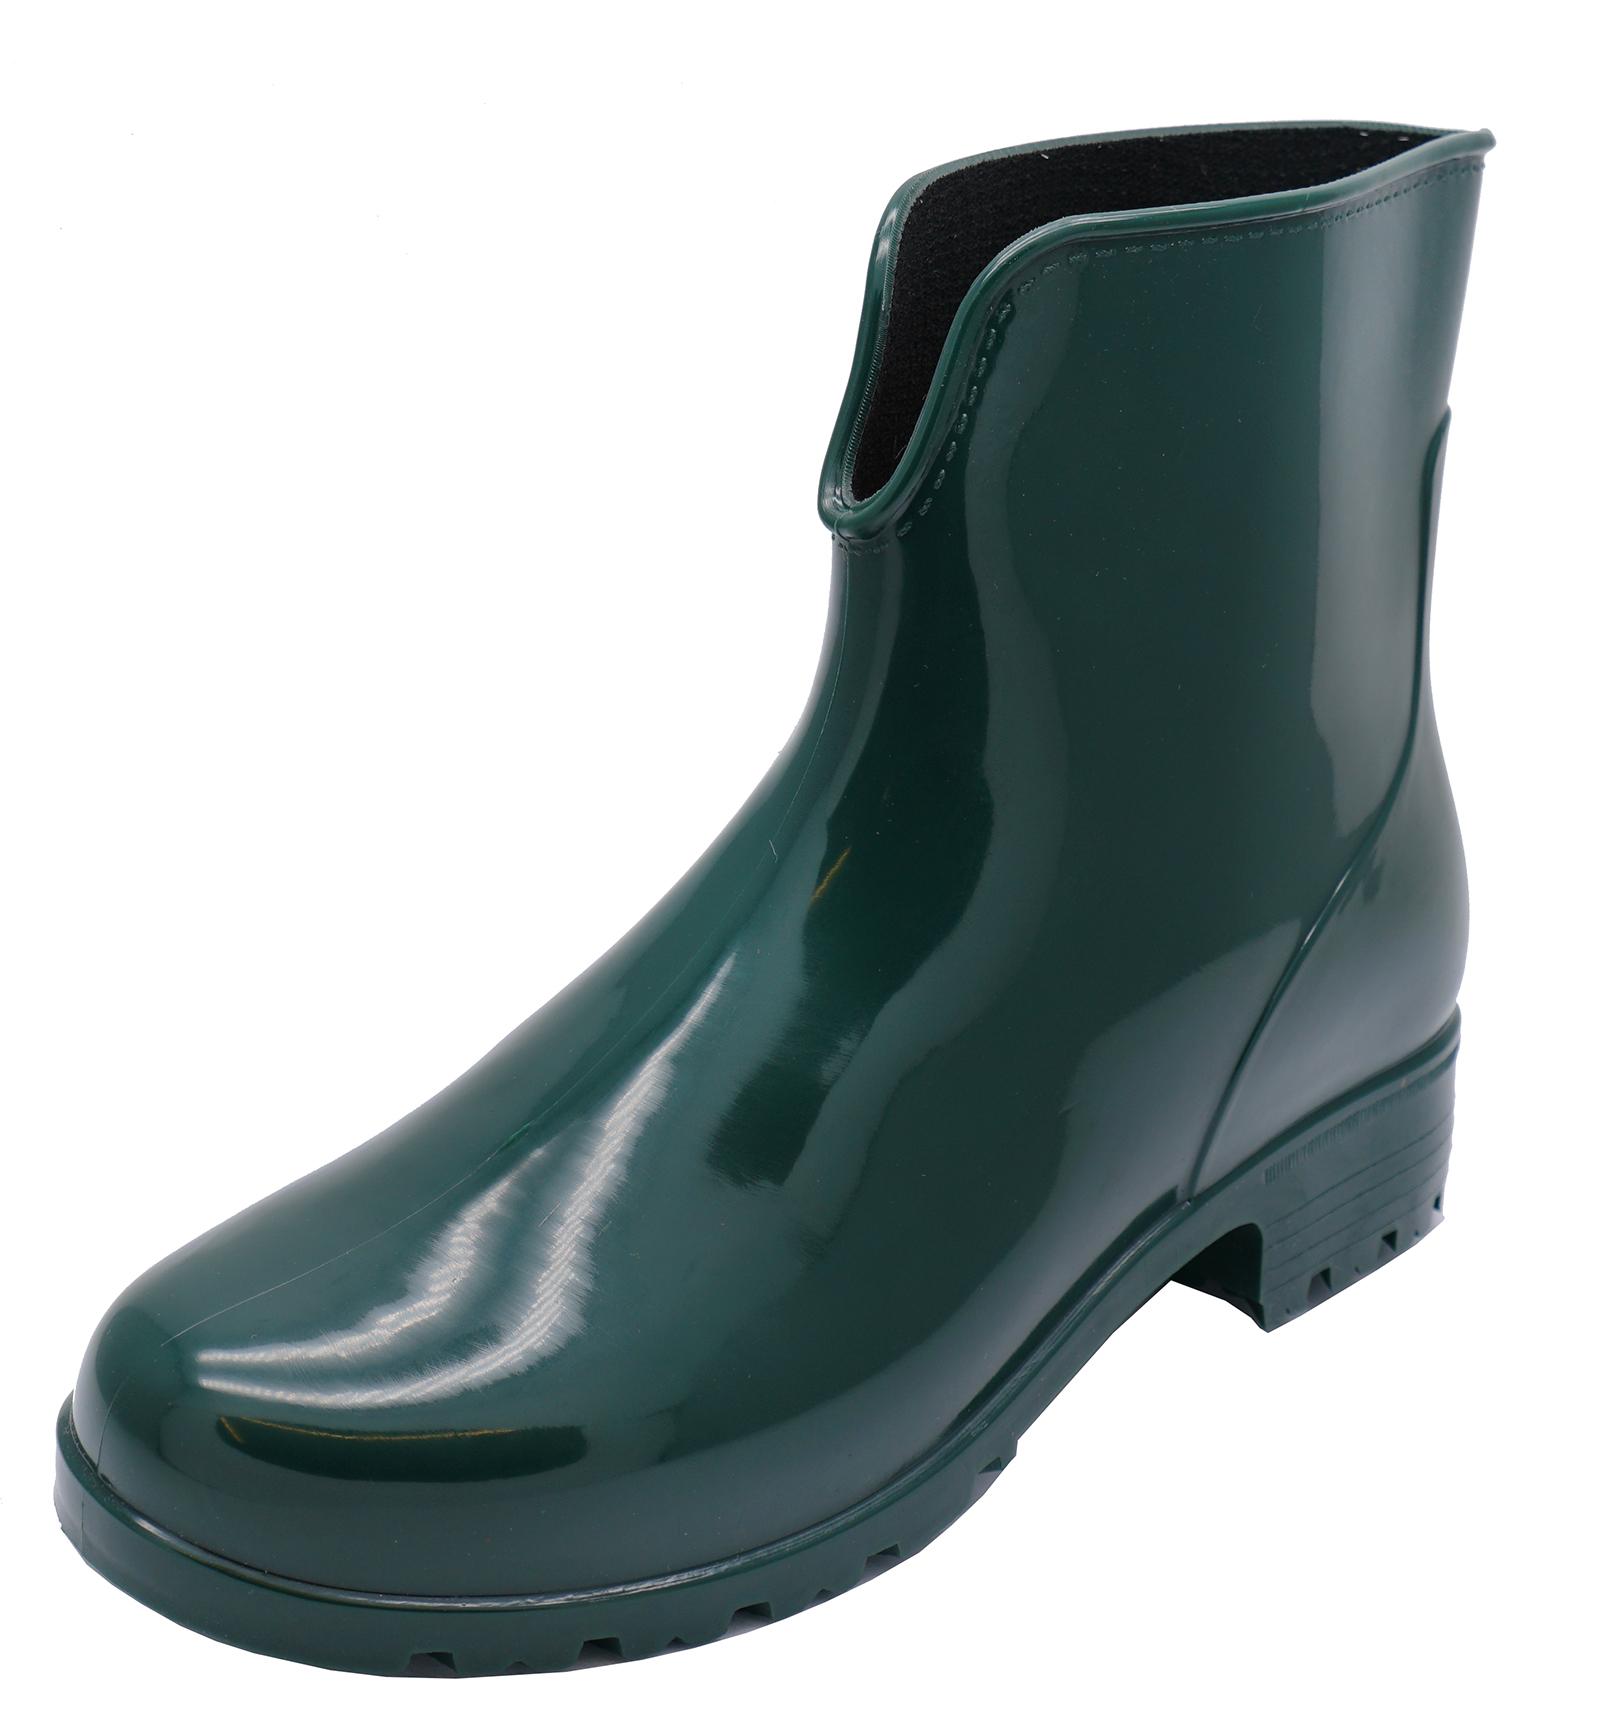 bd6dac00d5a Details about WOMENS GREEN ANKLE GARDEN WELLIES WELLINGTON WALKING RAIN  BOOTS SHOES SIZES 3-8